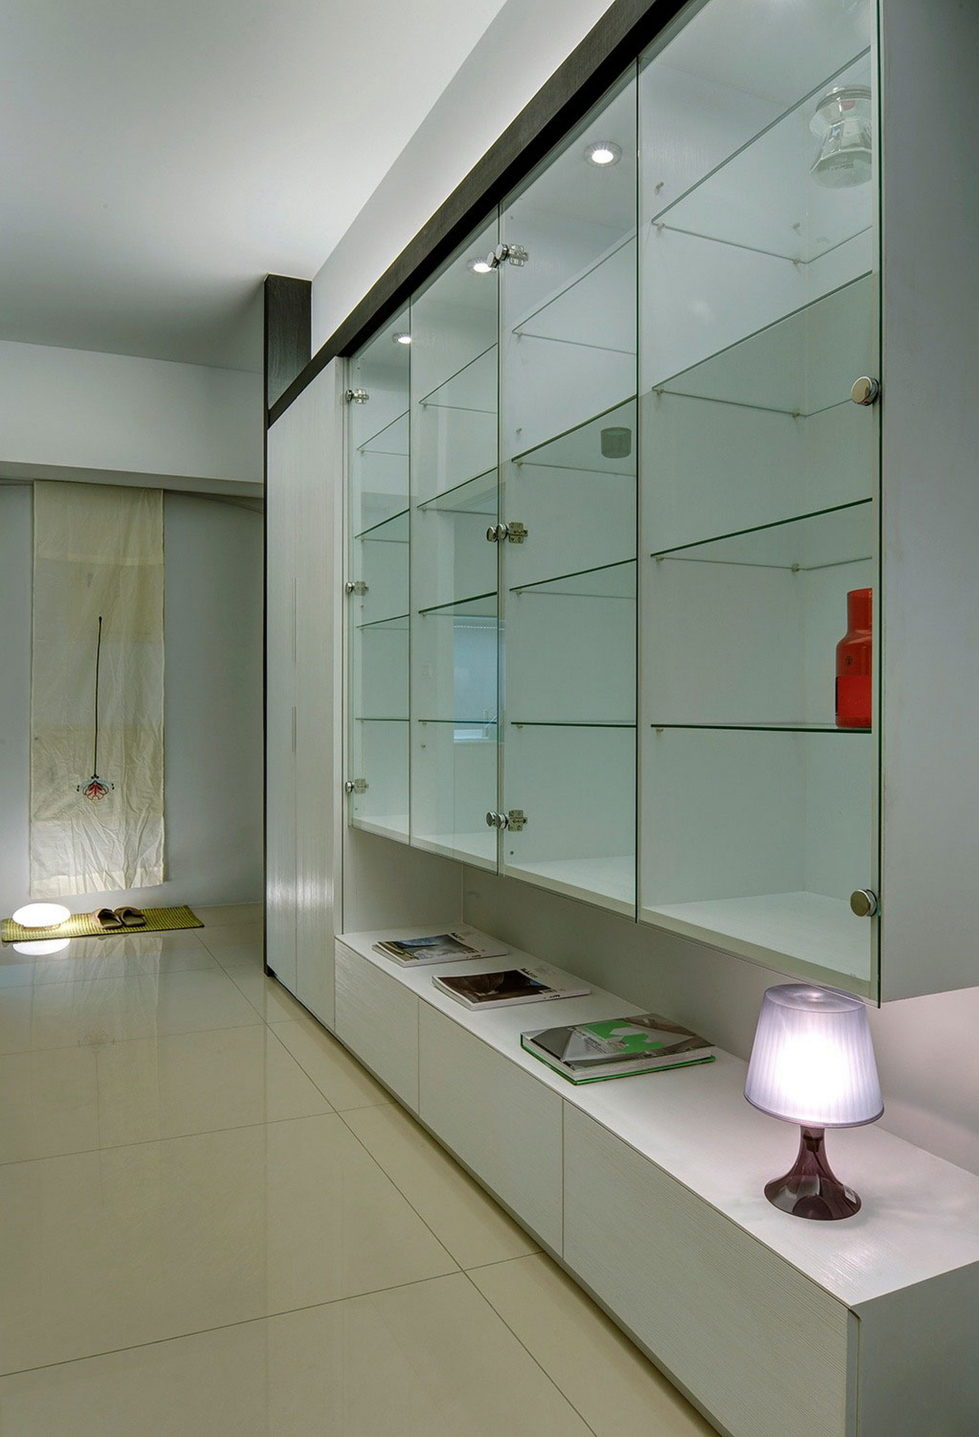 Wood Box Apartments From Cloud Pen Studio In Taichung, Taiwan 28